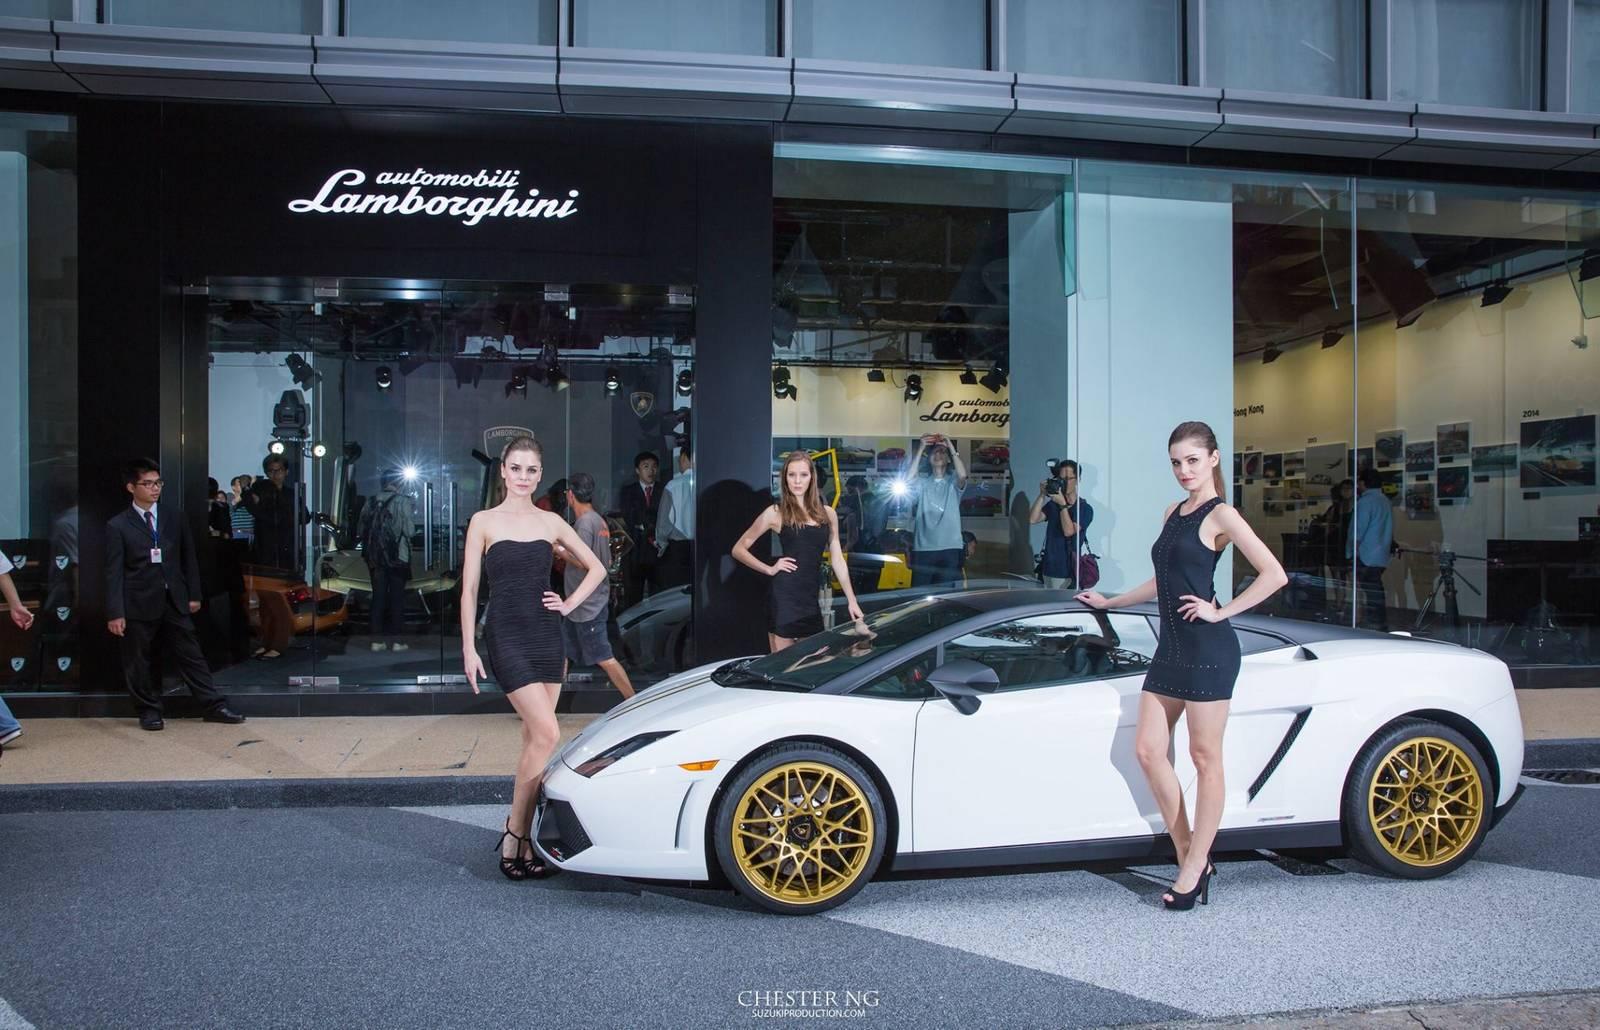 Lamborghini Hong Kong Opens First Pop Up Museum In Asia